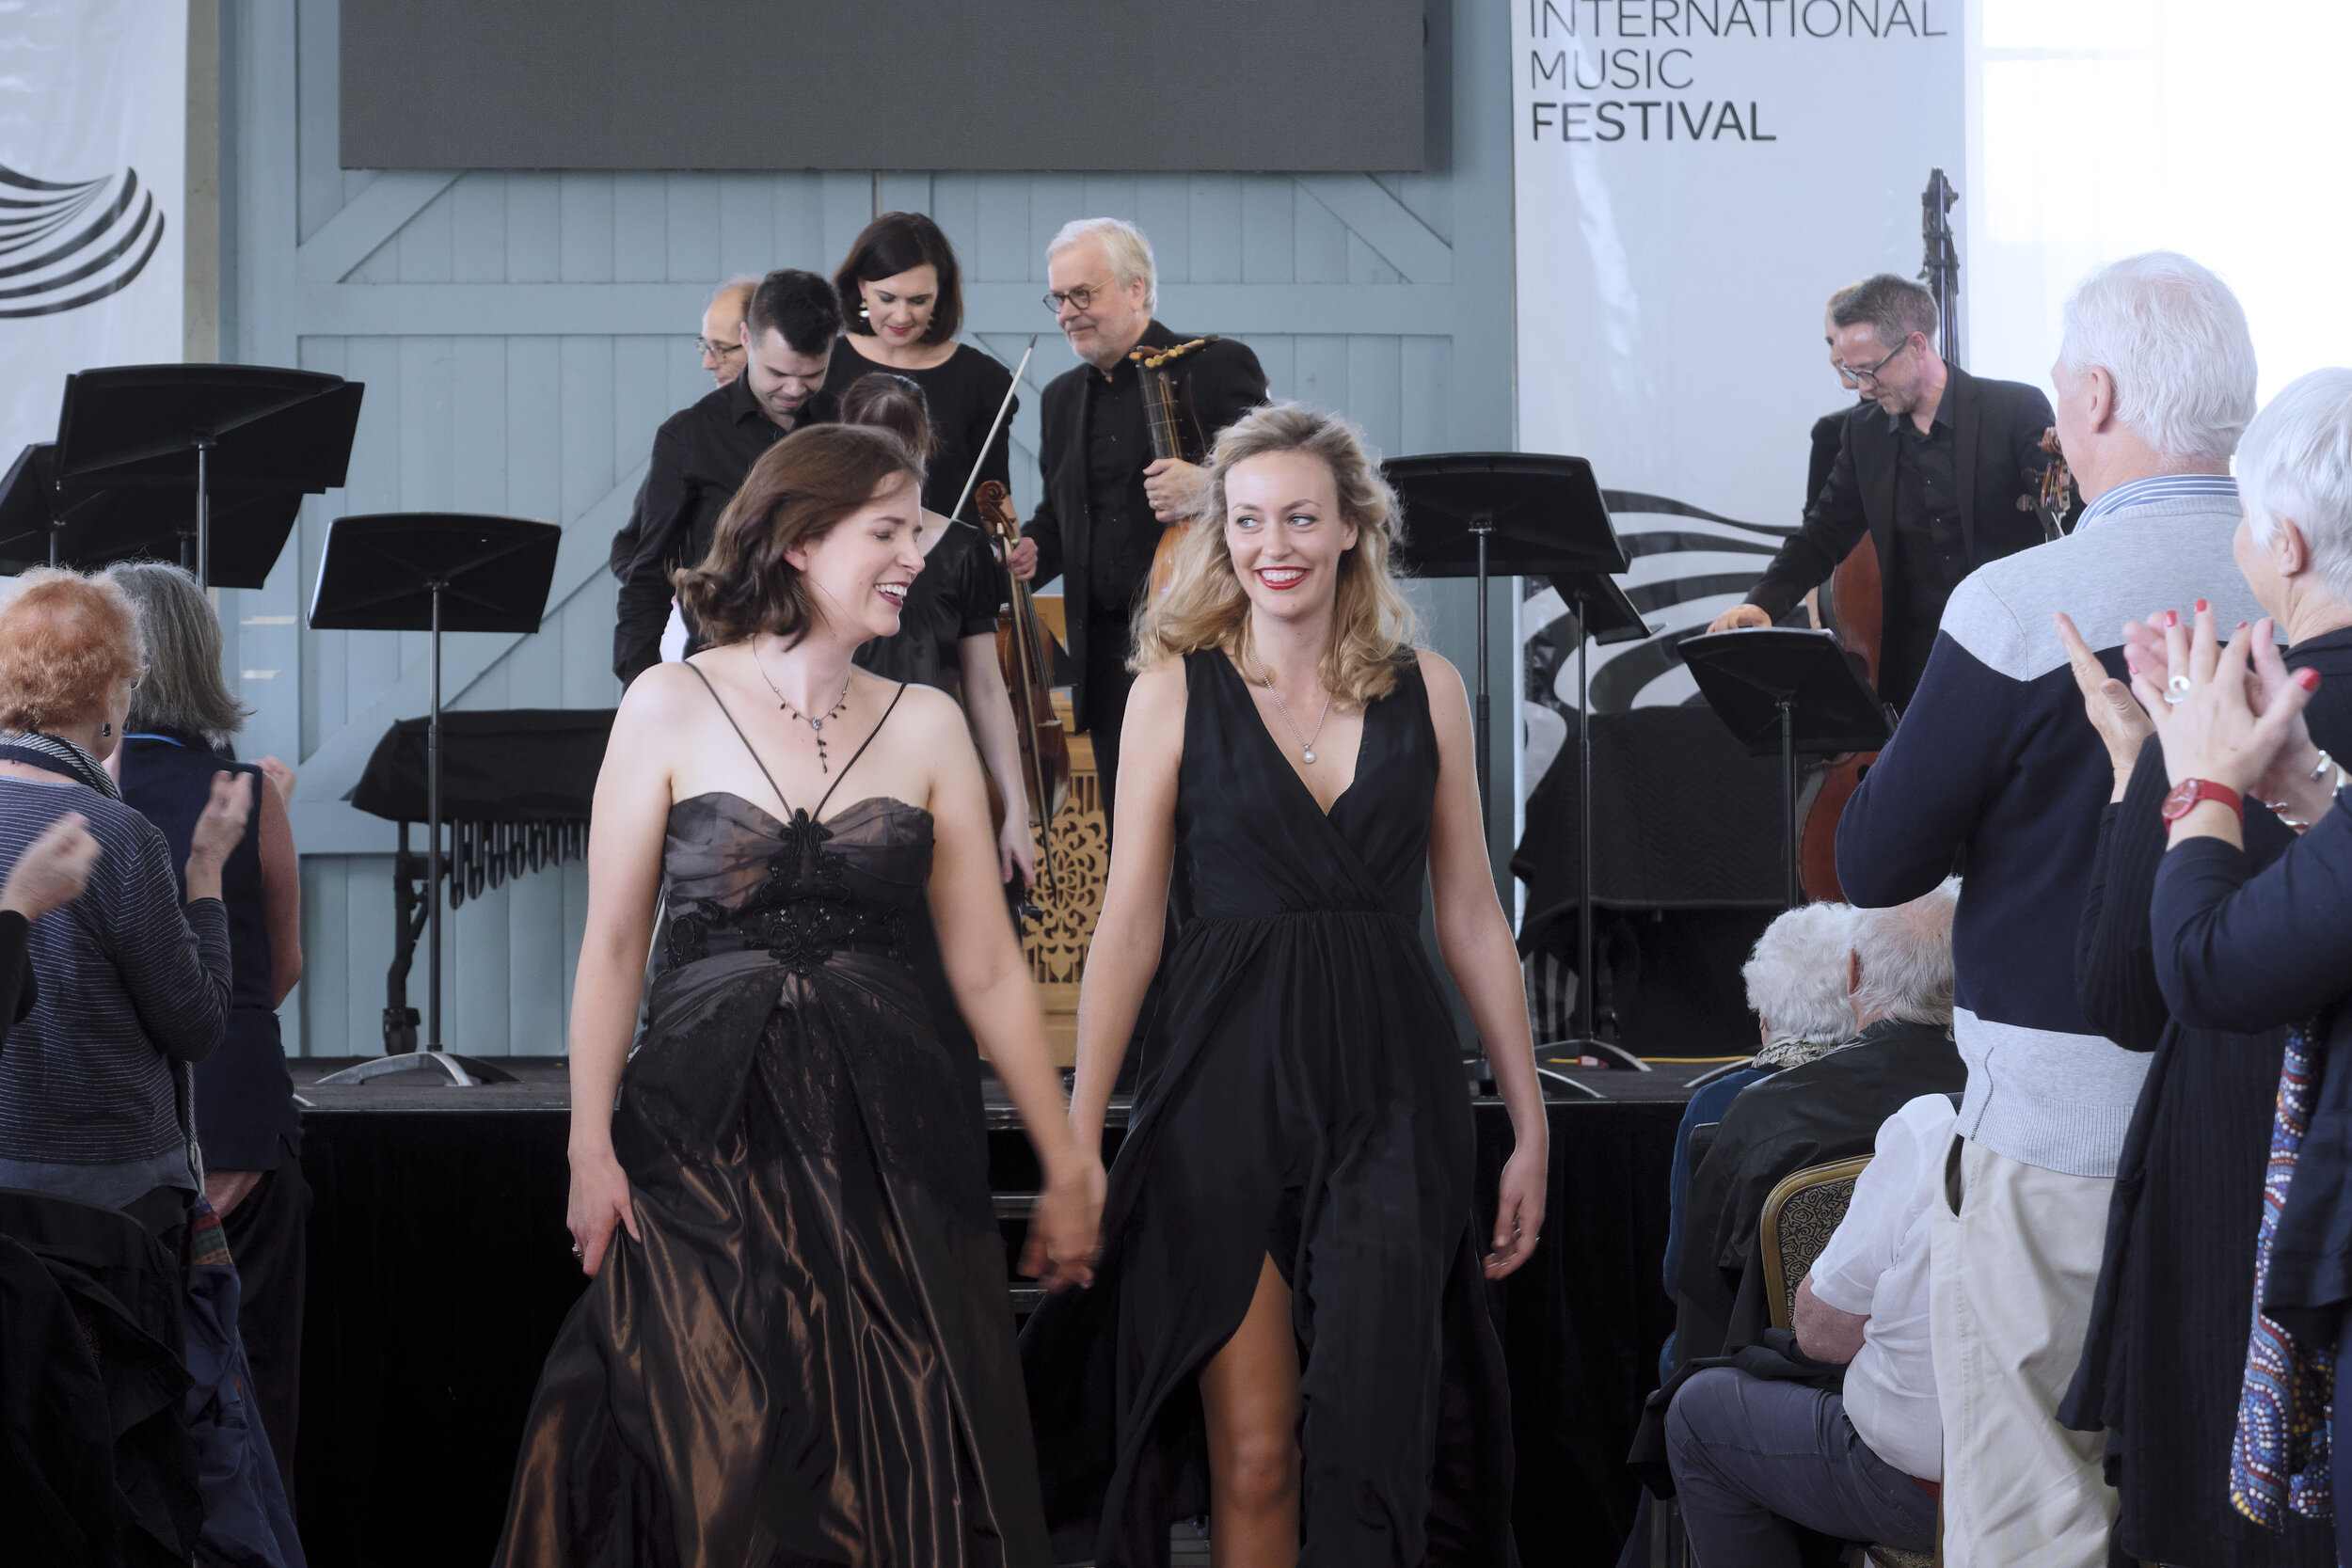 Concert 06. Bach's Orbit. Photo by Peter Hislop